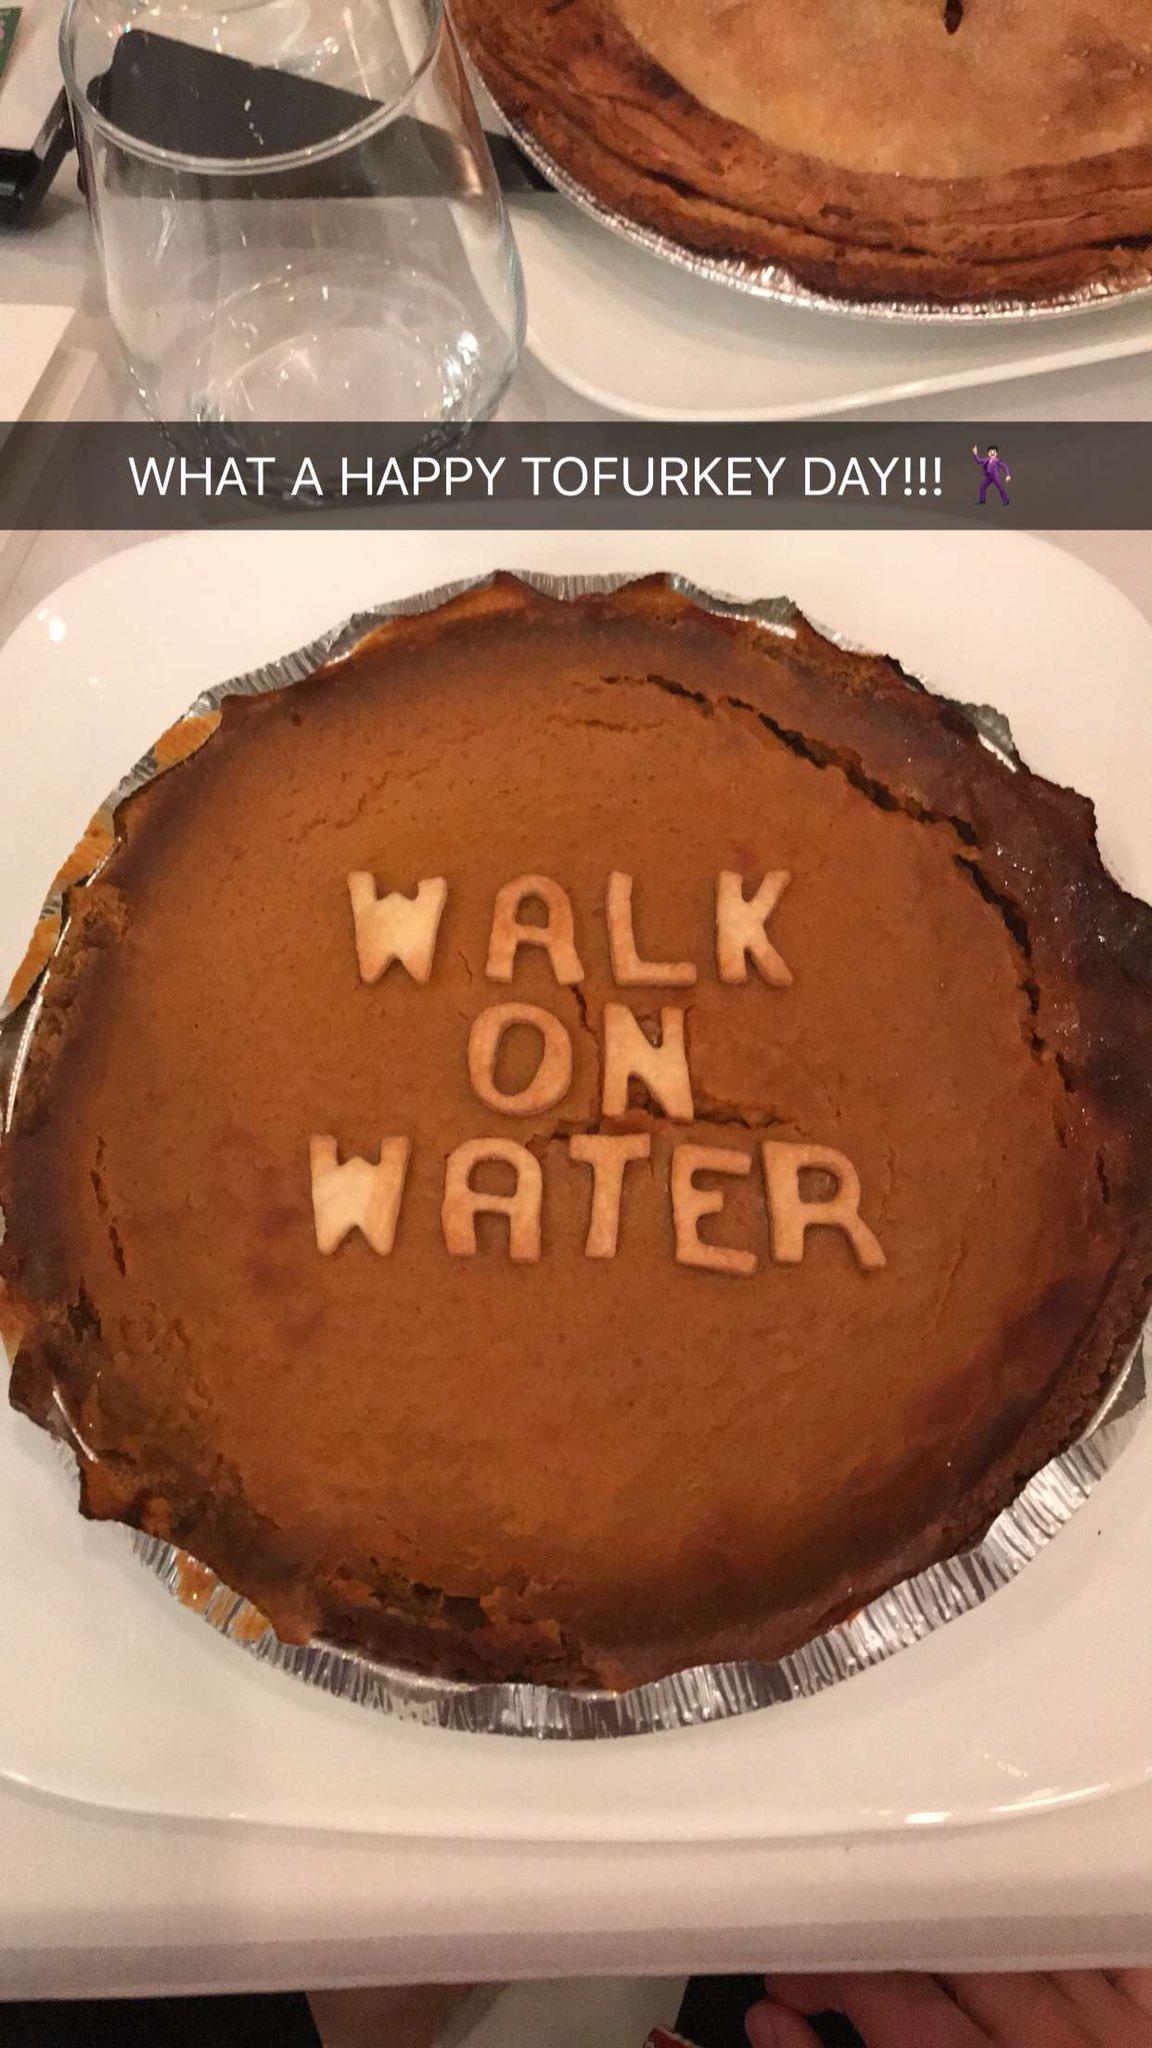 Happy Tofurkey Day!! �������� #WalkOnWater https://t.co/wtyw02MND1